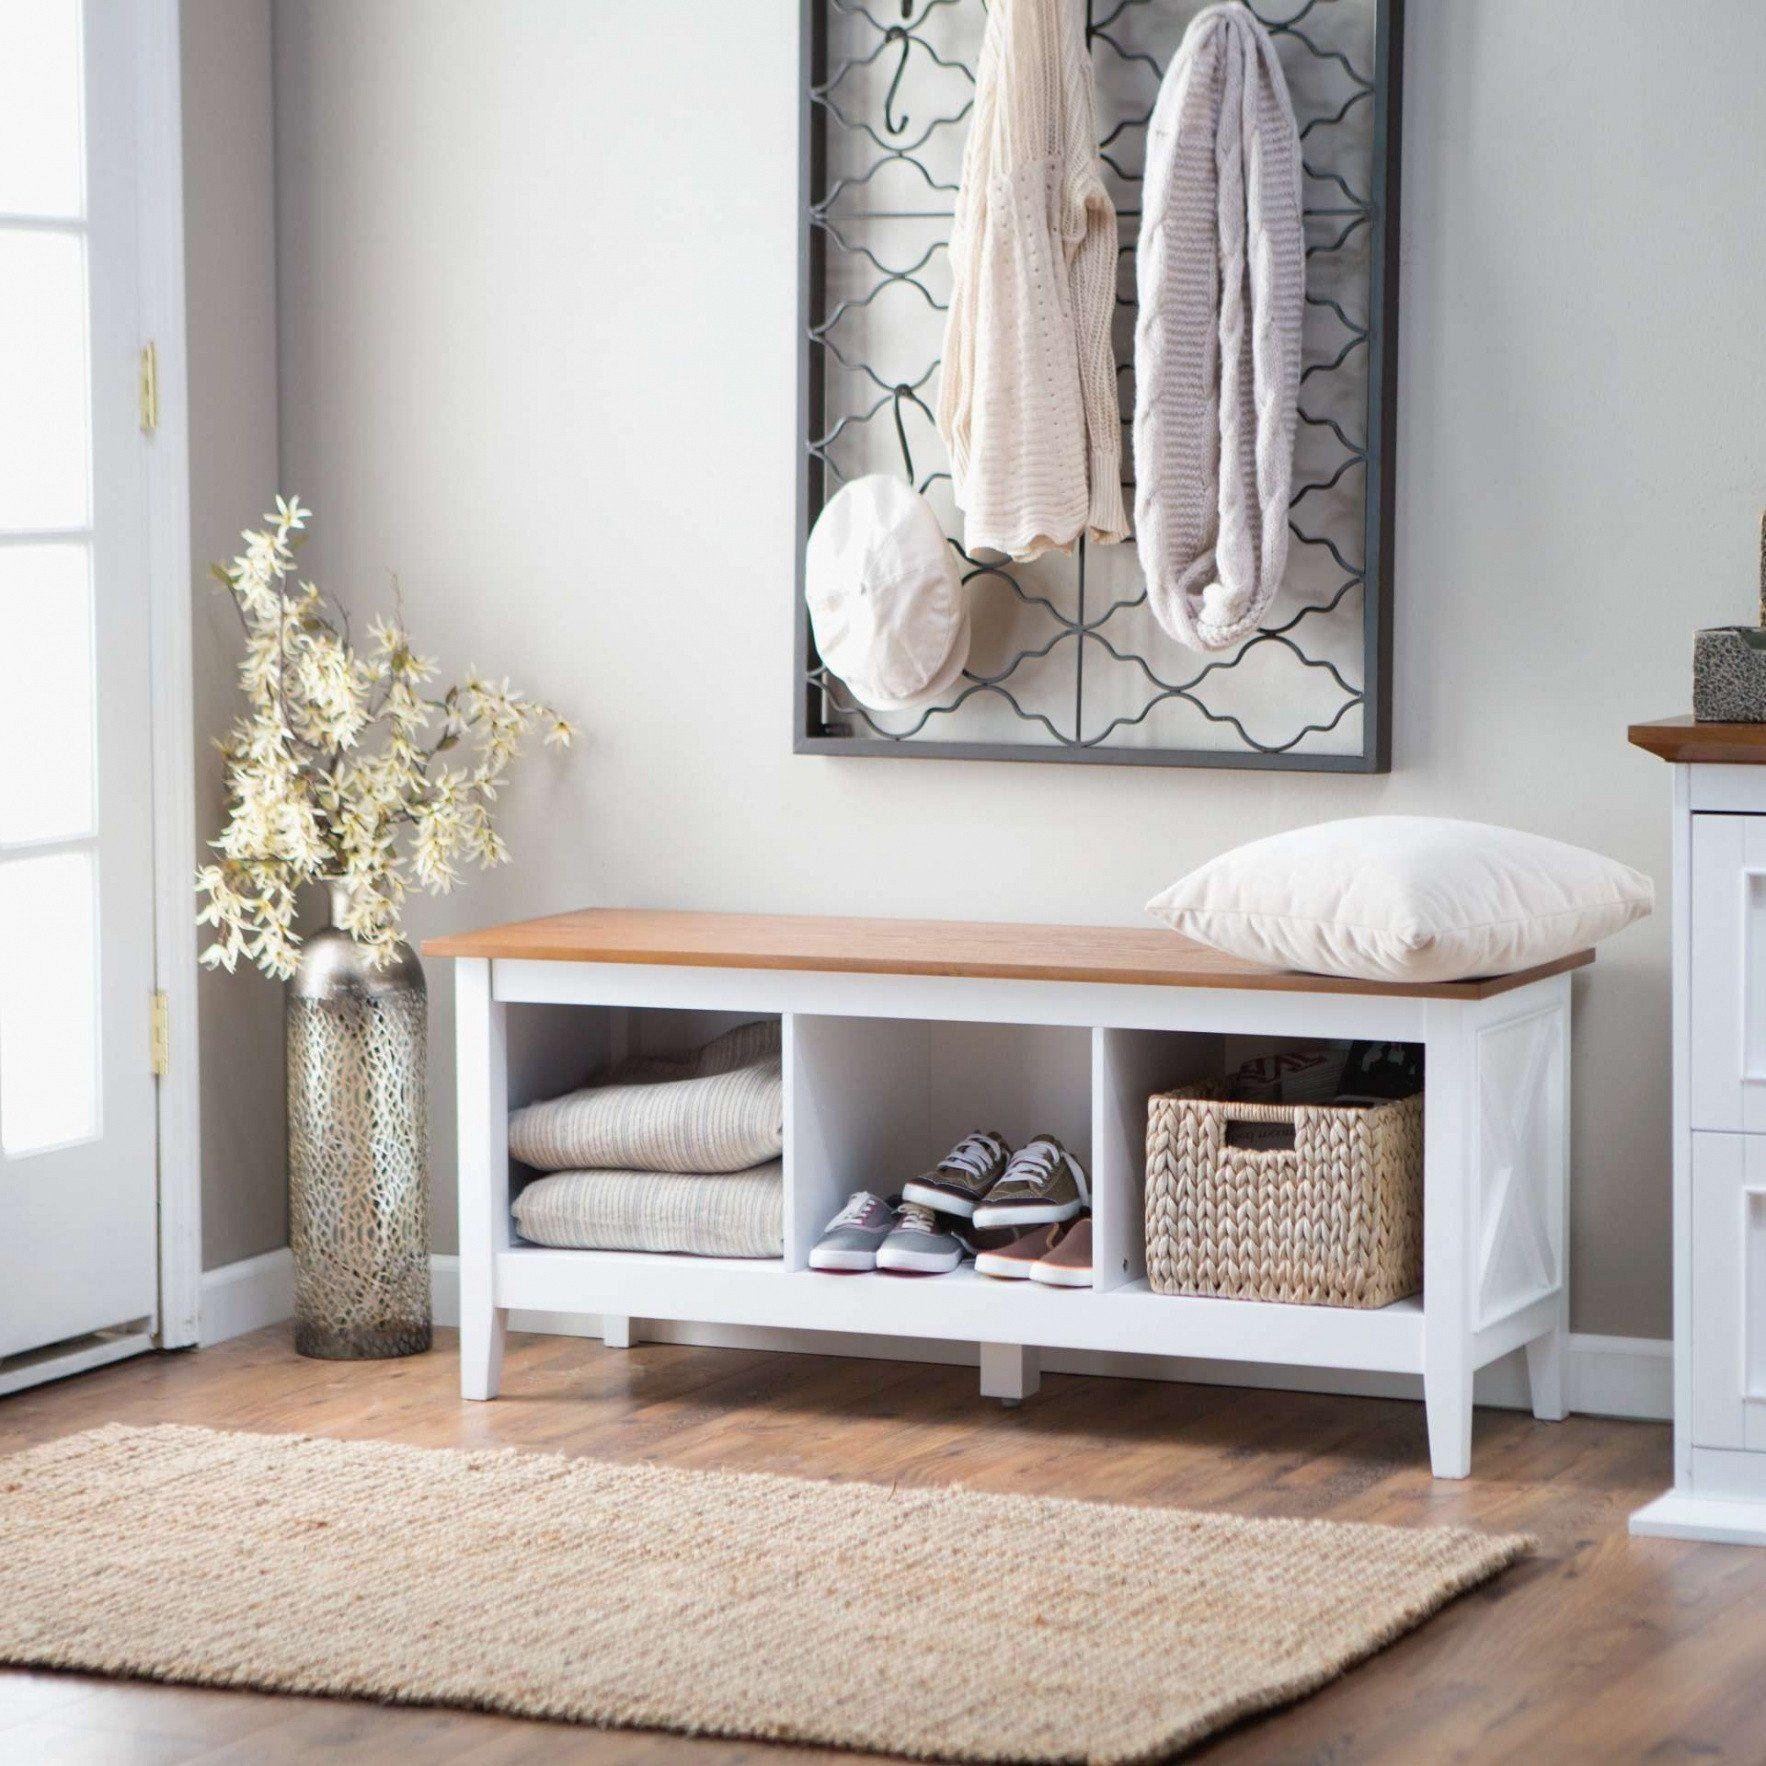 10+ Stunning White Living Room Wall Decor